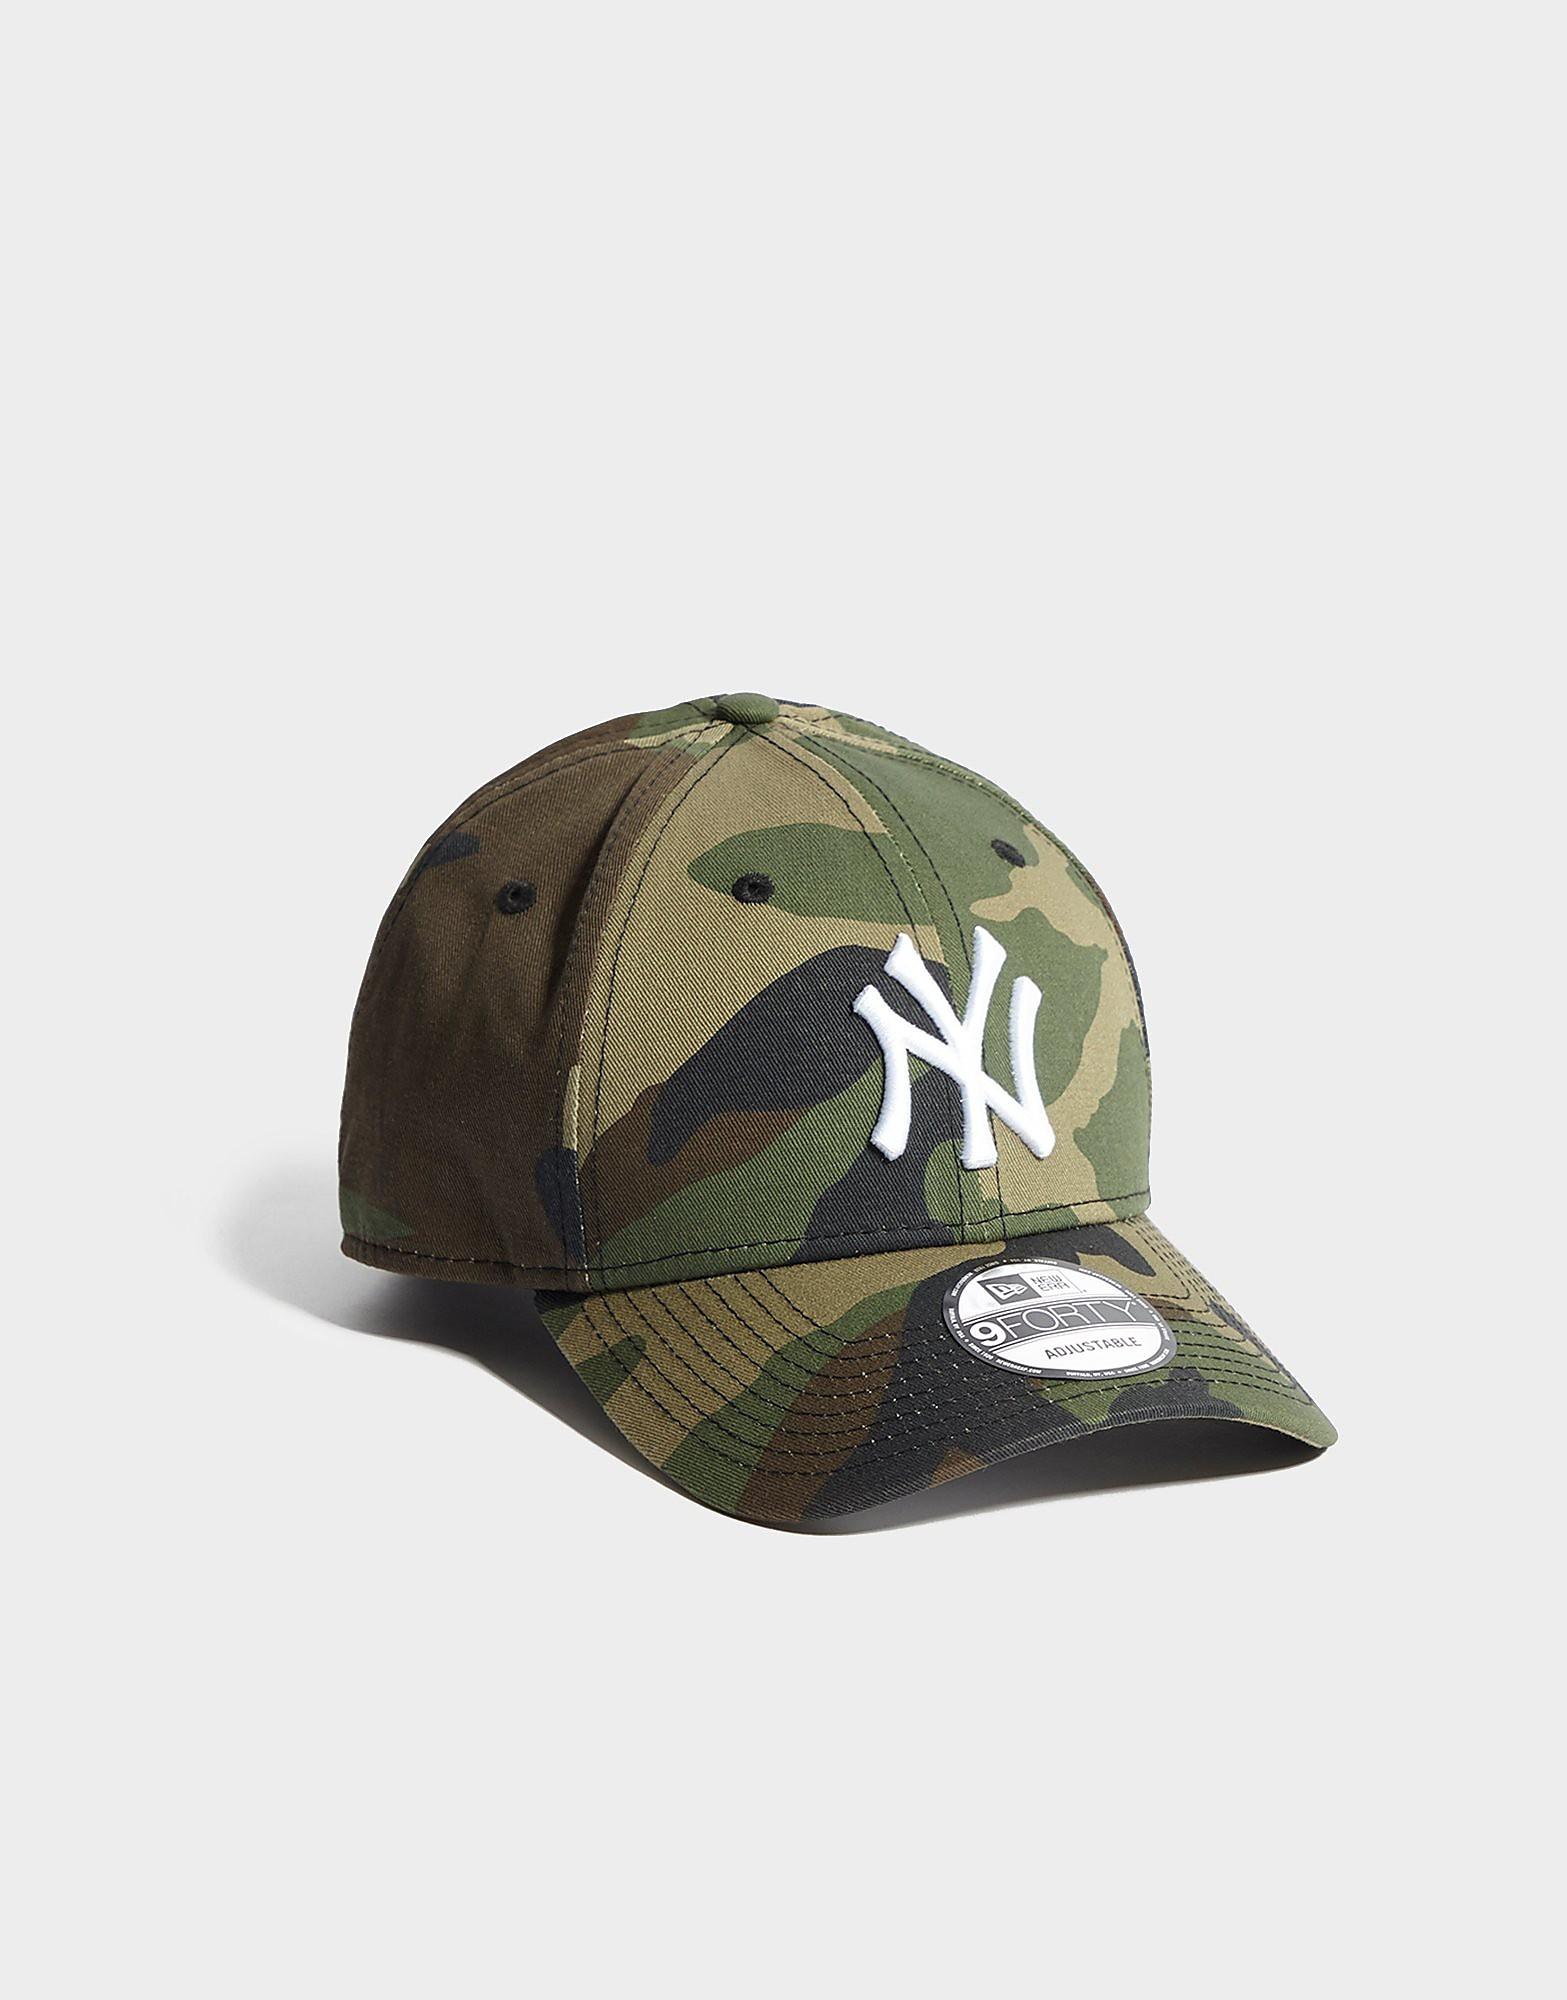 New Era MLB New York Yankees 9FORTY keps